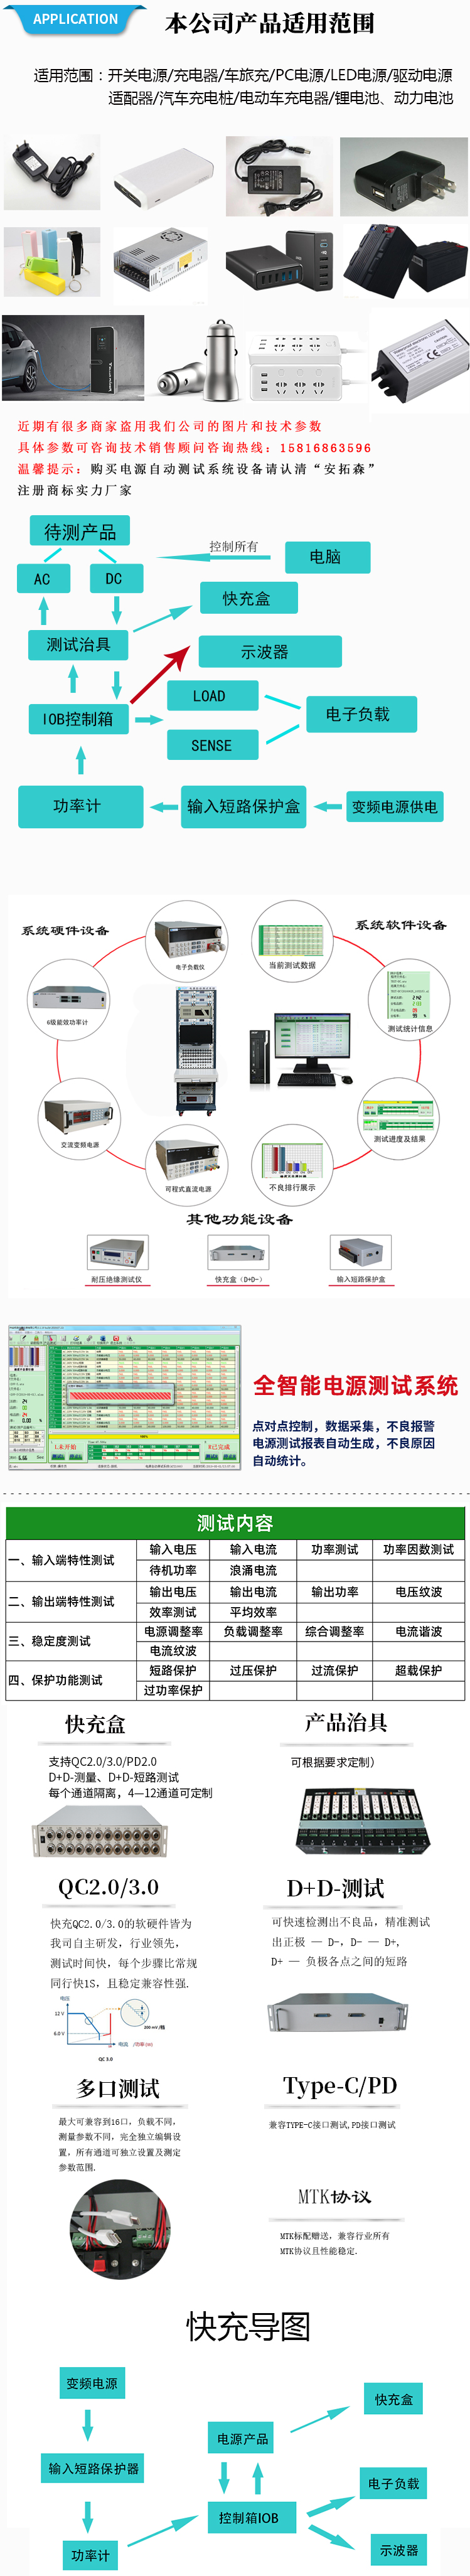 LED驱动电源测试系统